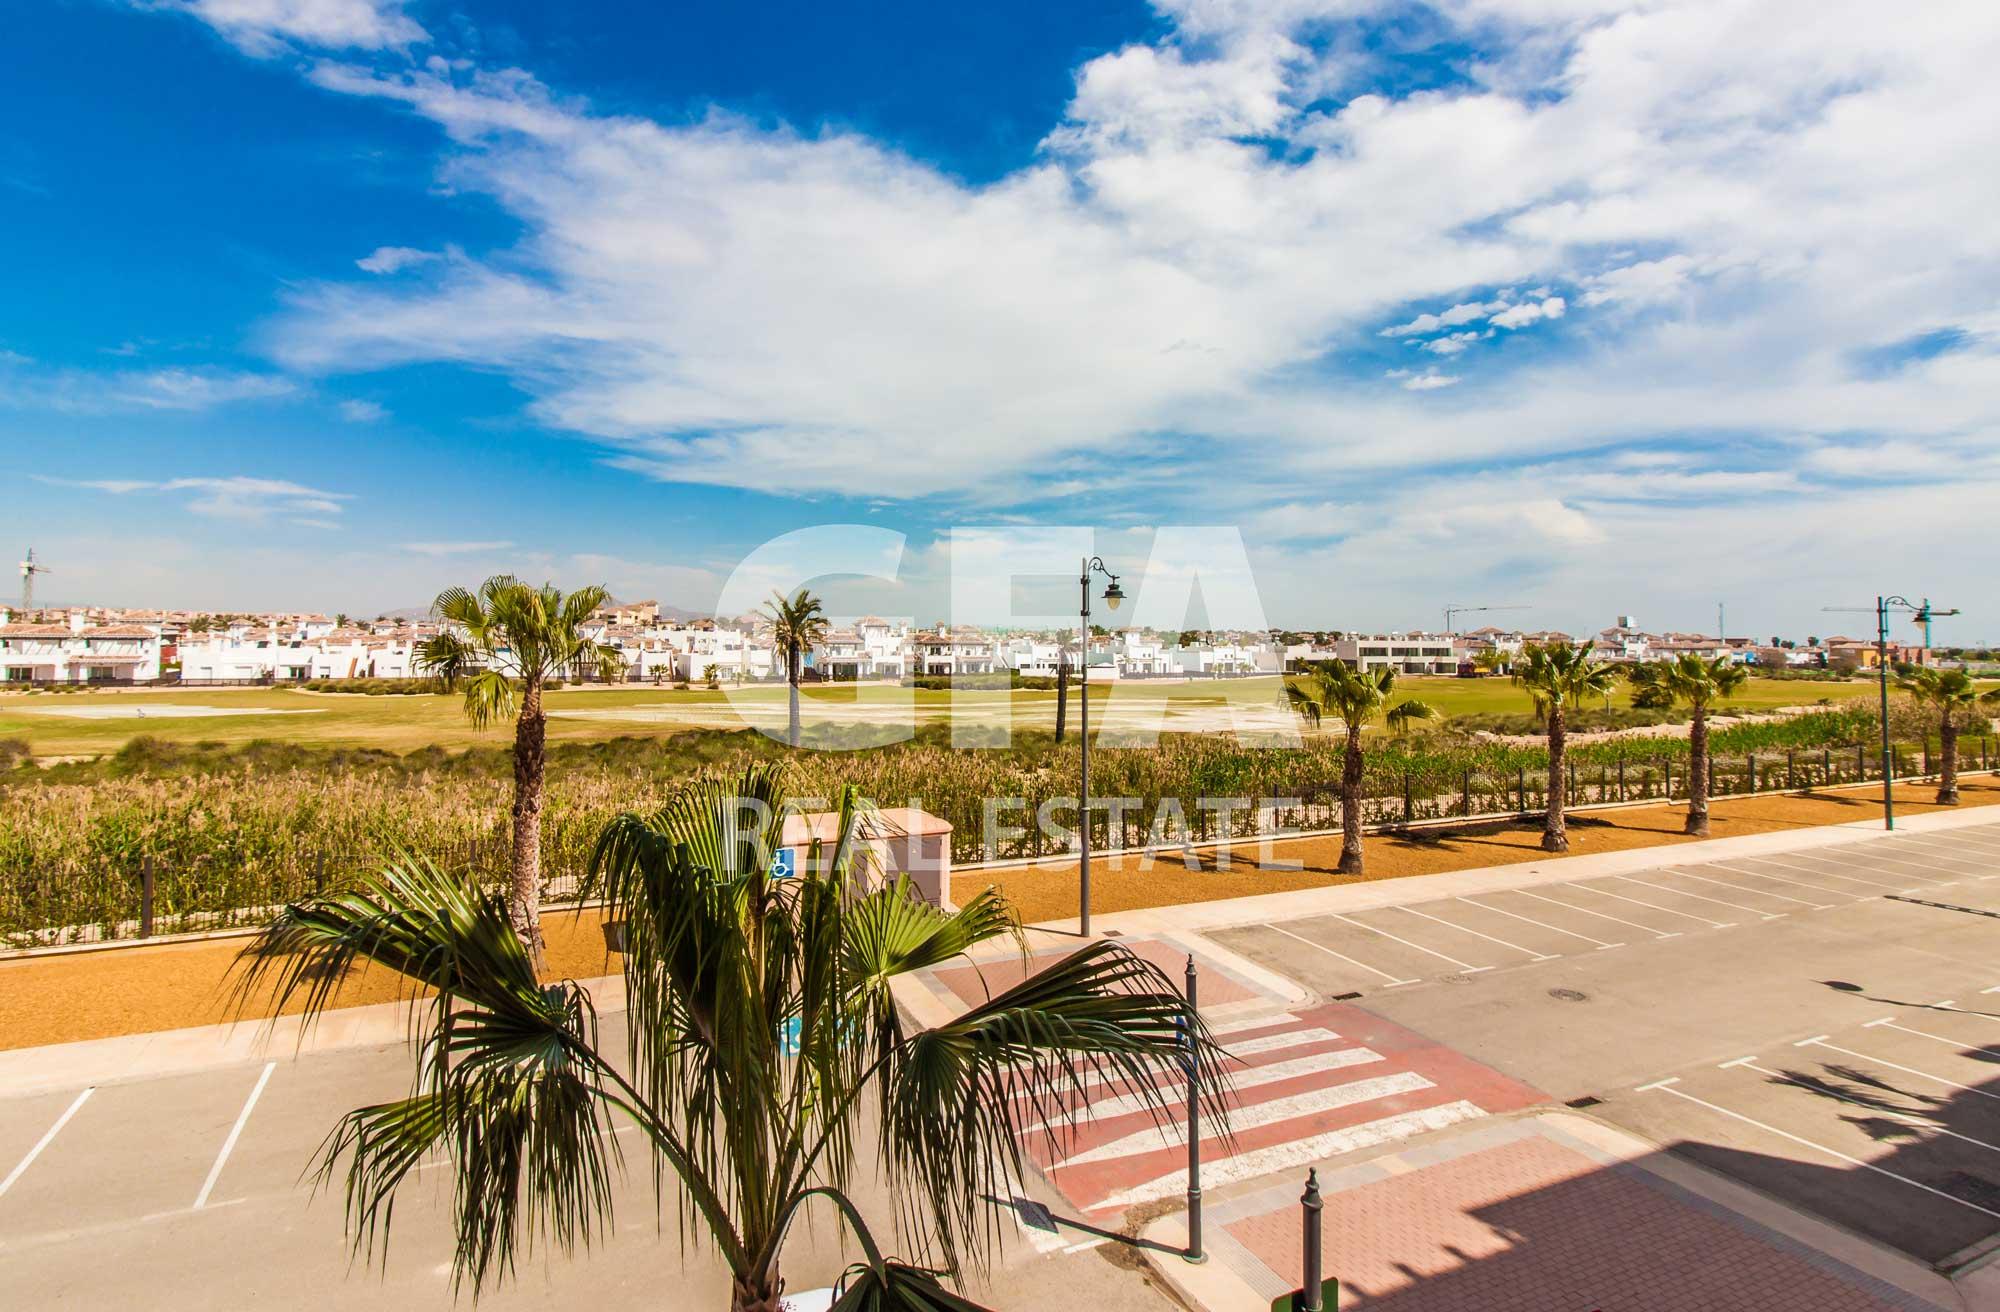 boulevard-viviendas-de-obra-nueva-resort-mar-menor (38)